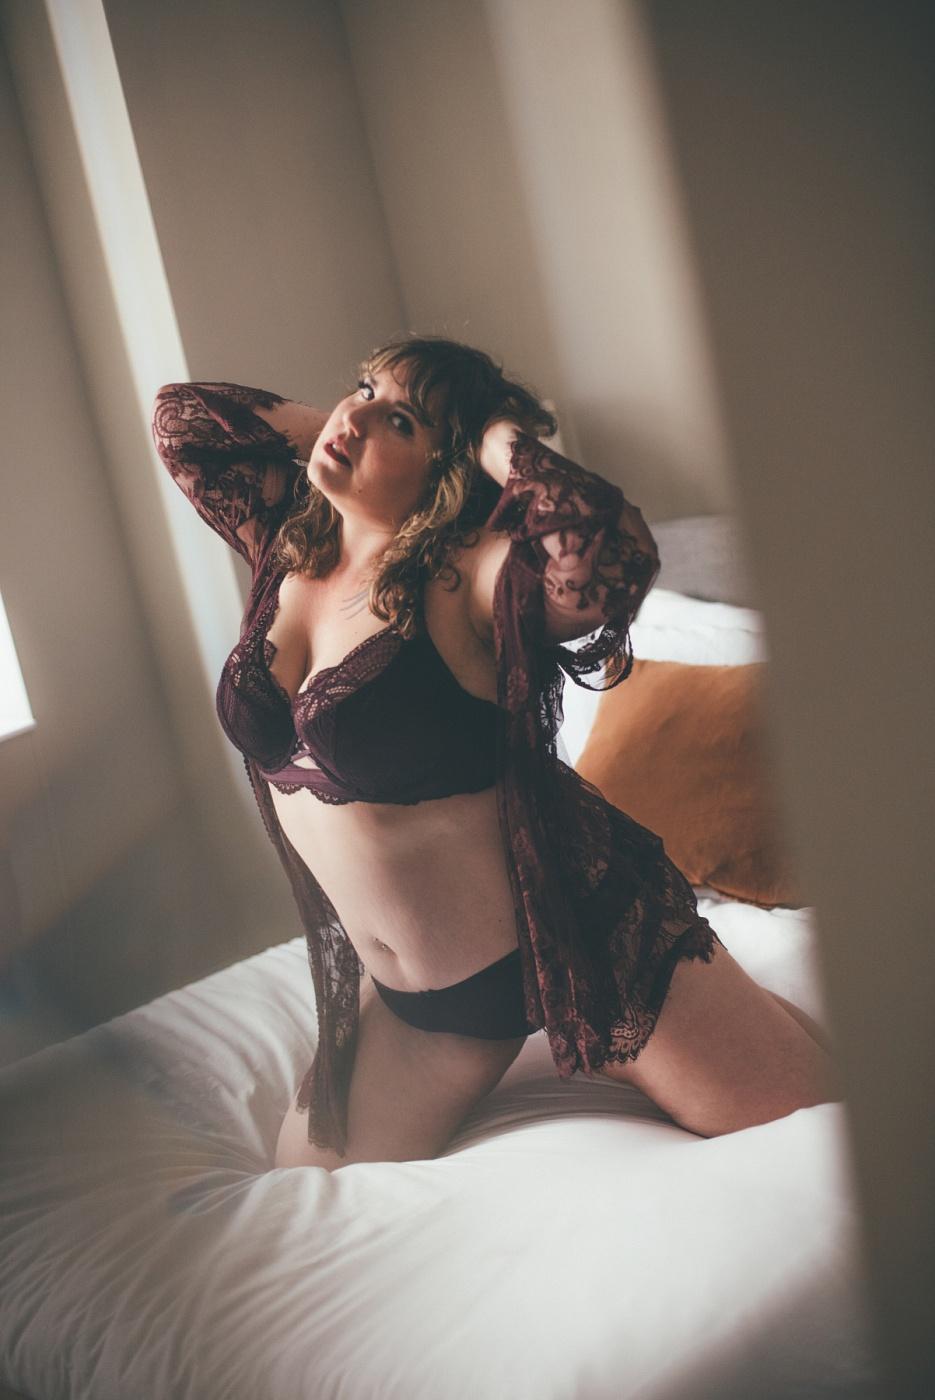 Raven Wilde